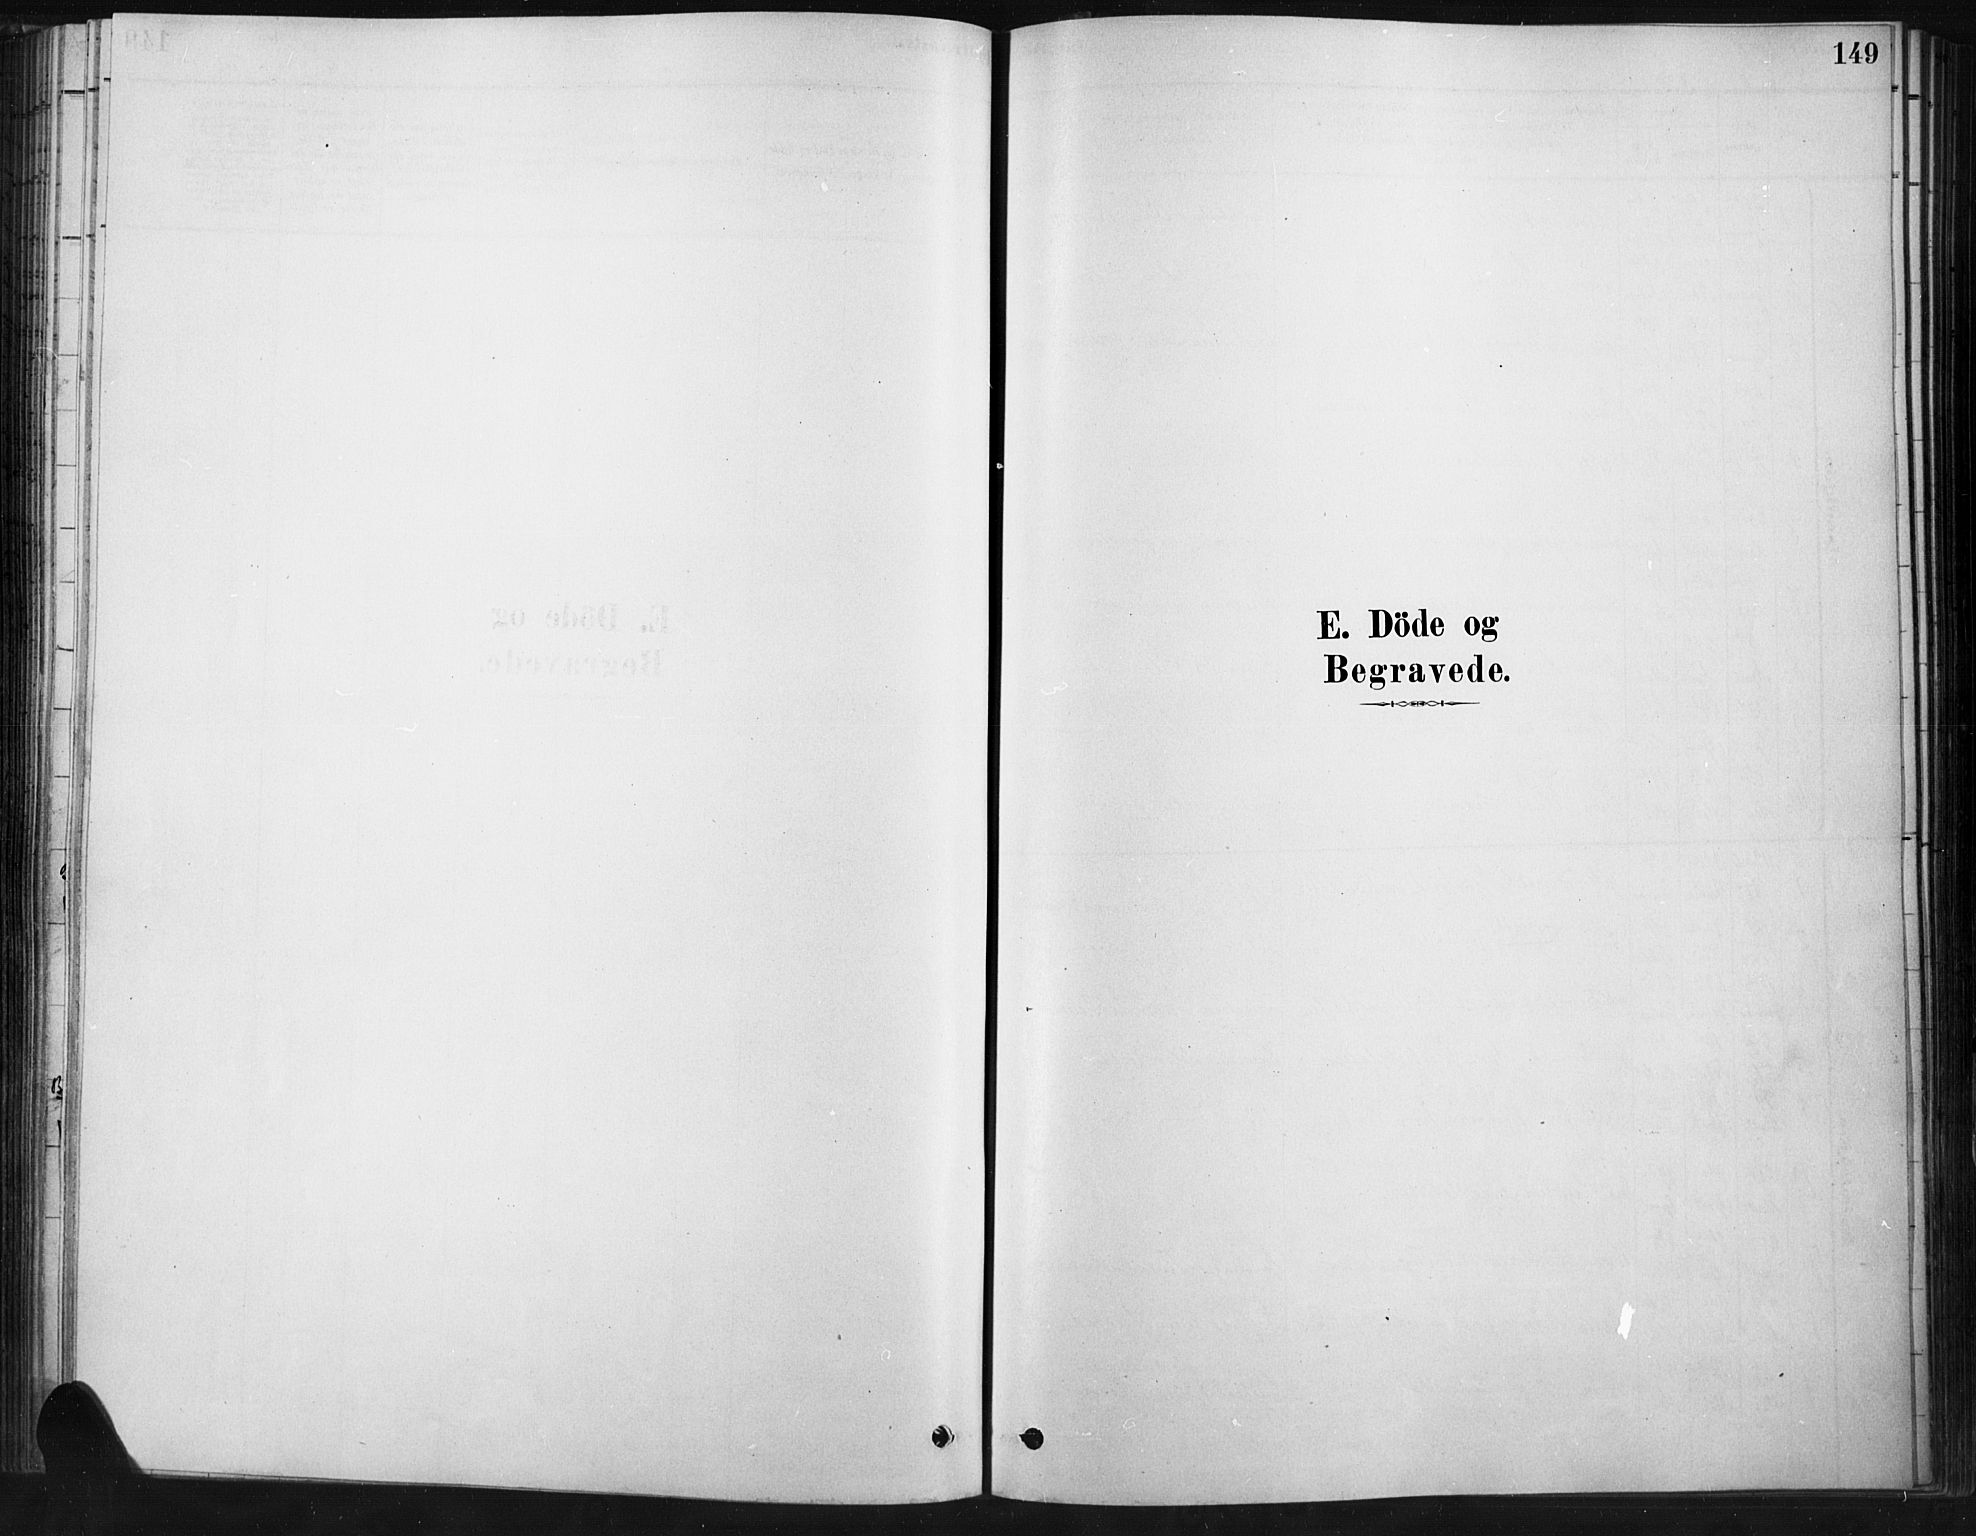 SAH, Ringebu prestekontor, Ministerialbok nr. 9, 1878-1898, s. 149